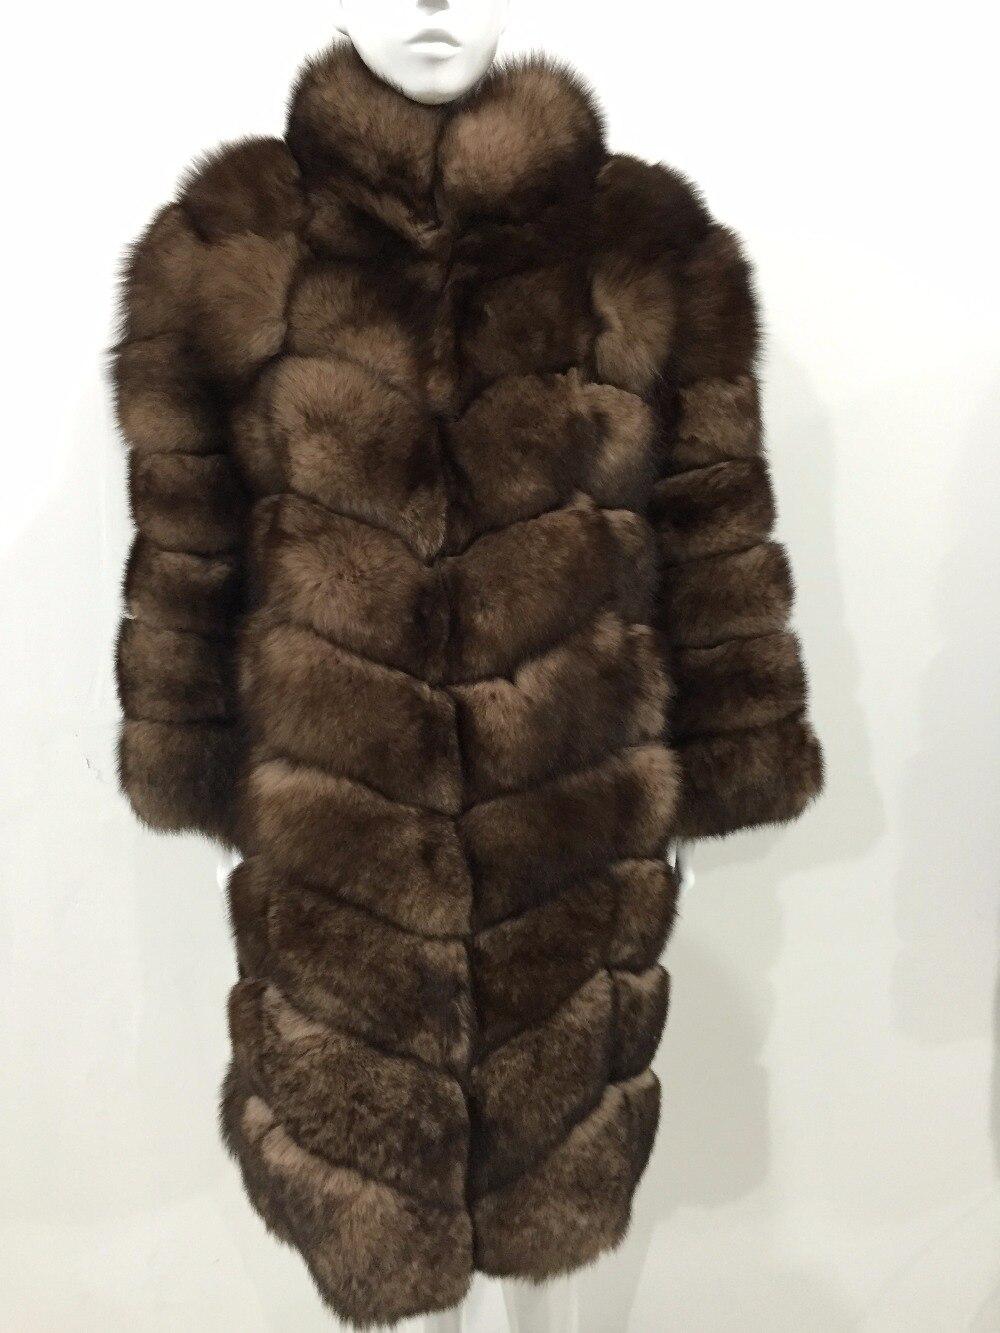 Mens Leather Fur Coats Promotion-Shop for Promotional Mens Leather